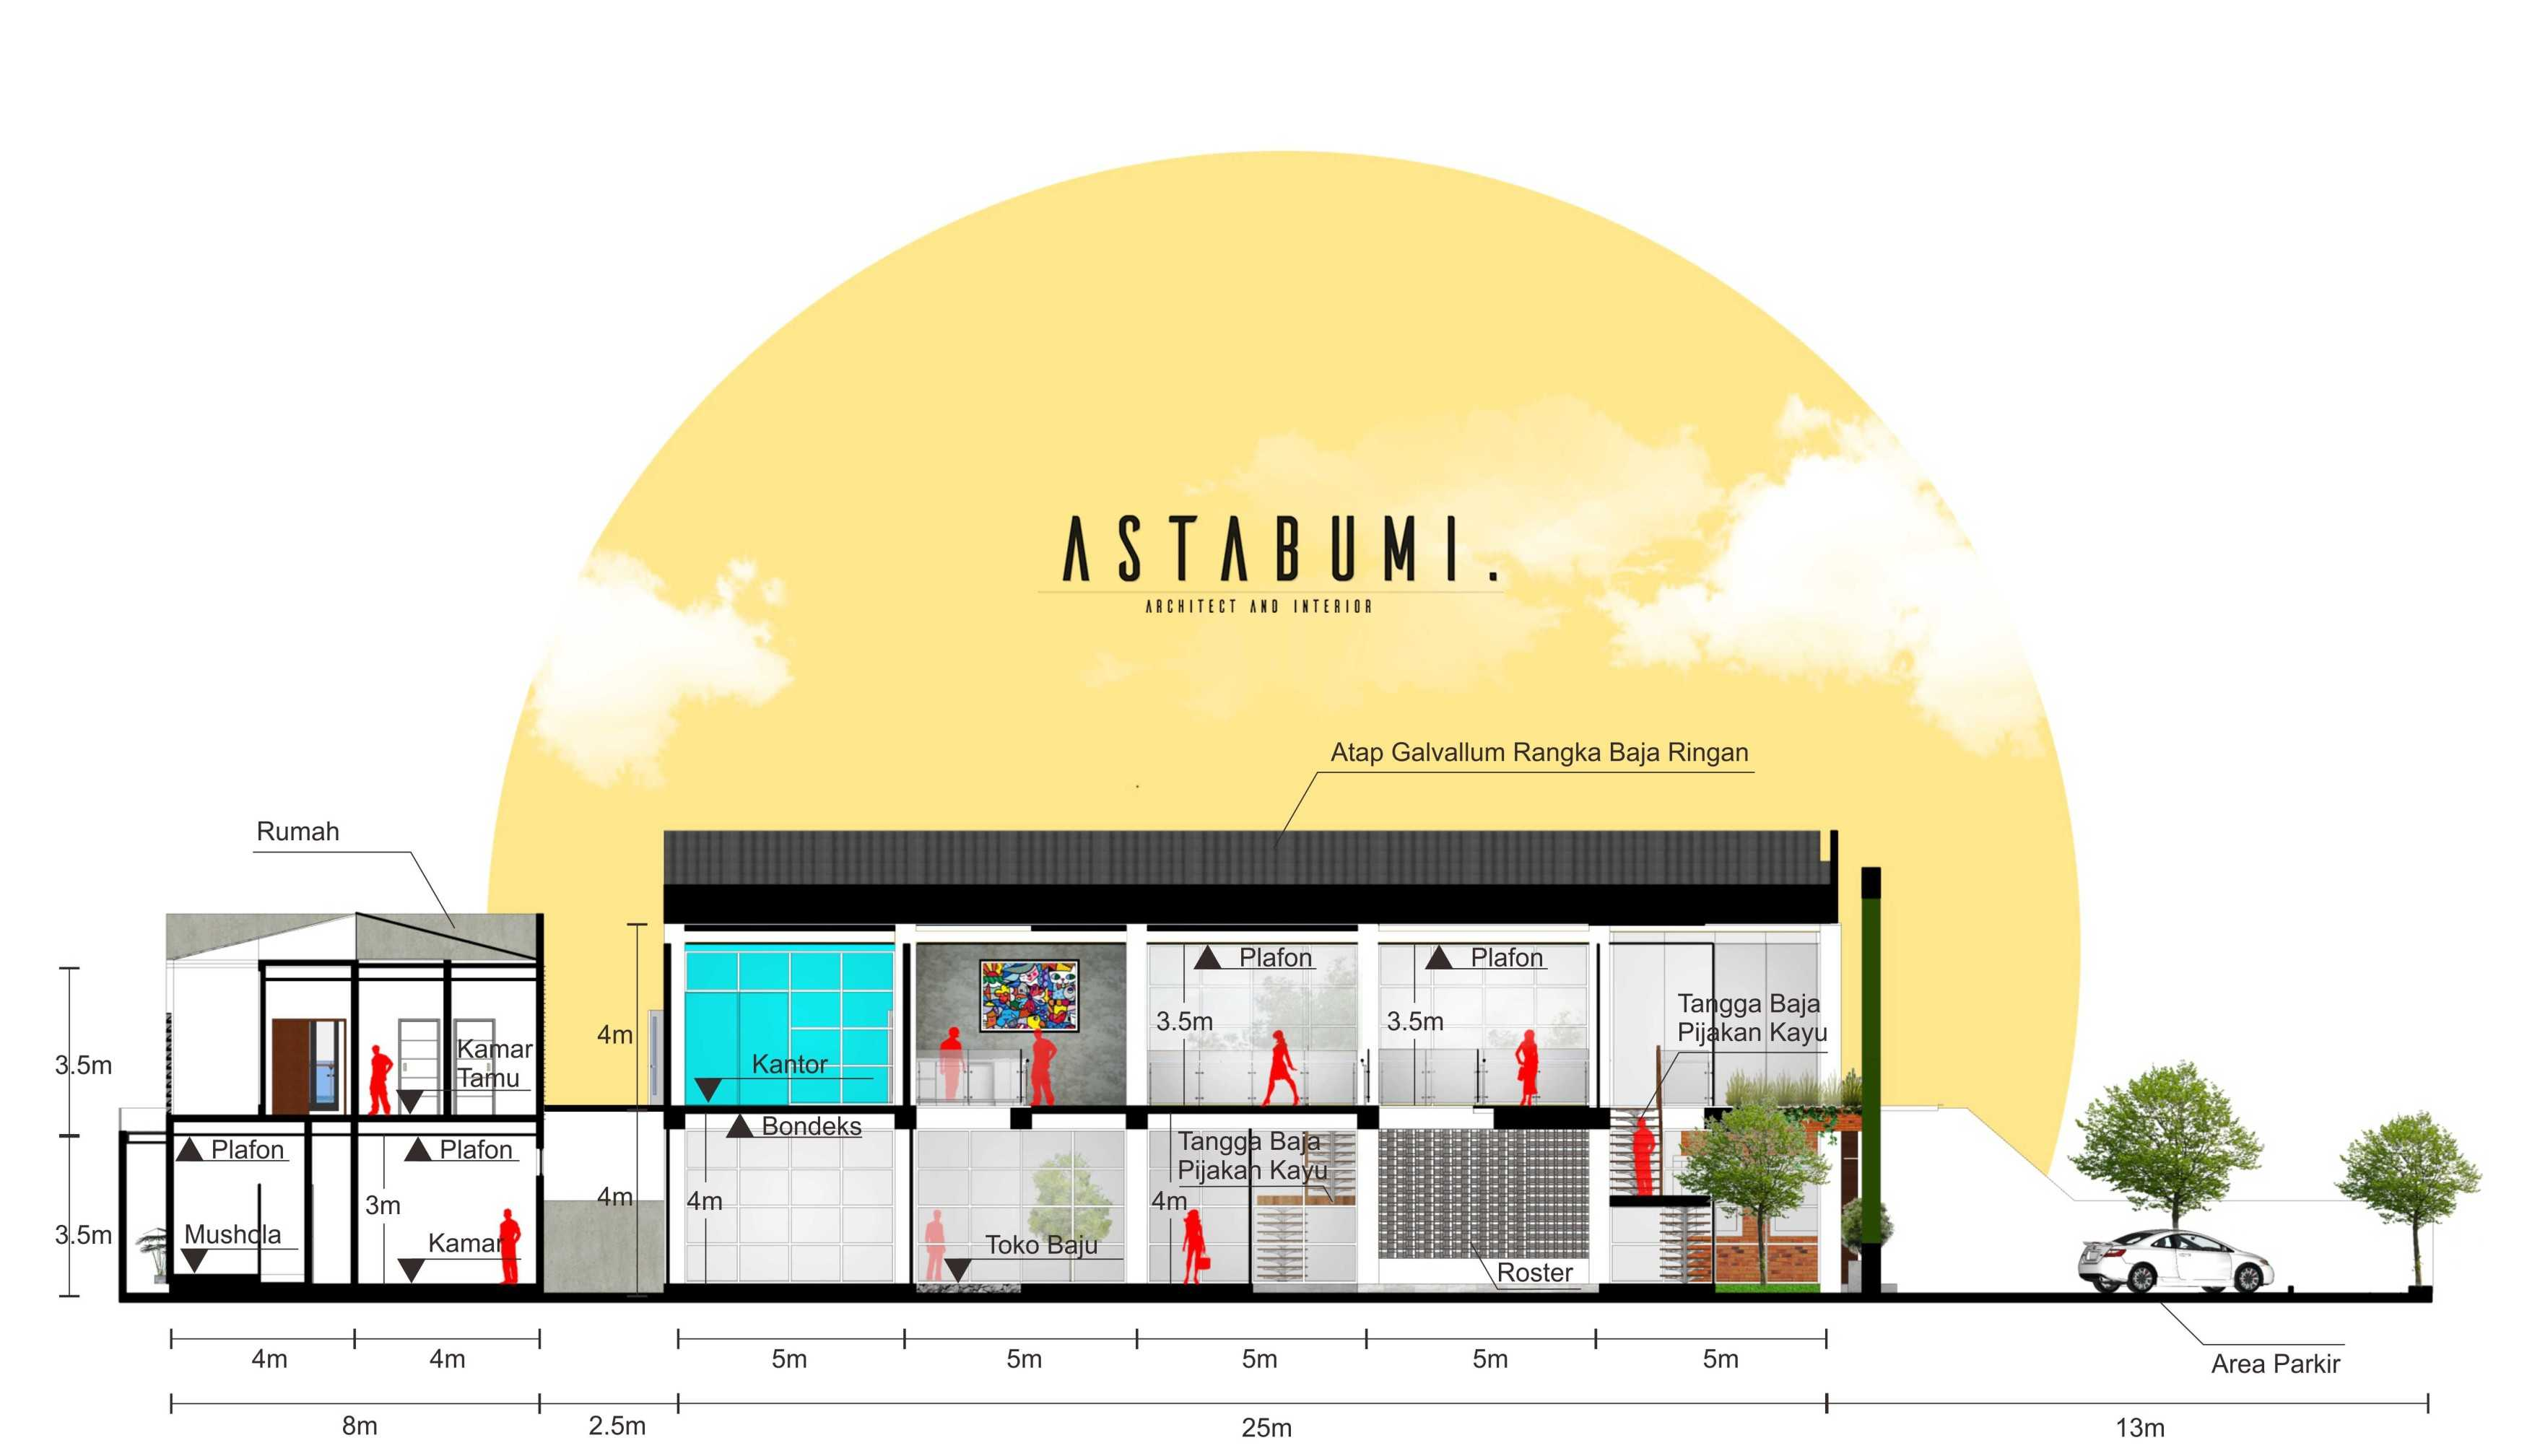 Astabumi Architect & Interior Design Star Fashion Boyolali Kabupaten Boyolali, Jawa Tengah, Indonesia Kabupaten Boyolali, Jawa Tengah, Indonesia Astabumi-Architect-Interior-Design-Star-Fashion-Boyolali   64307